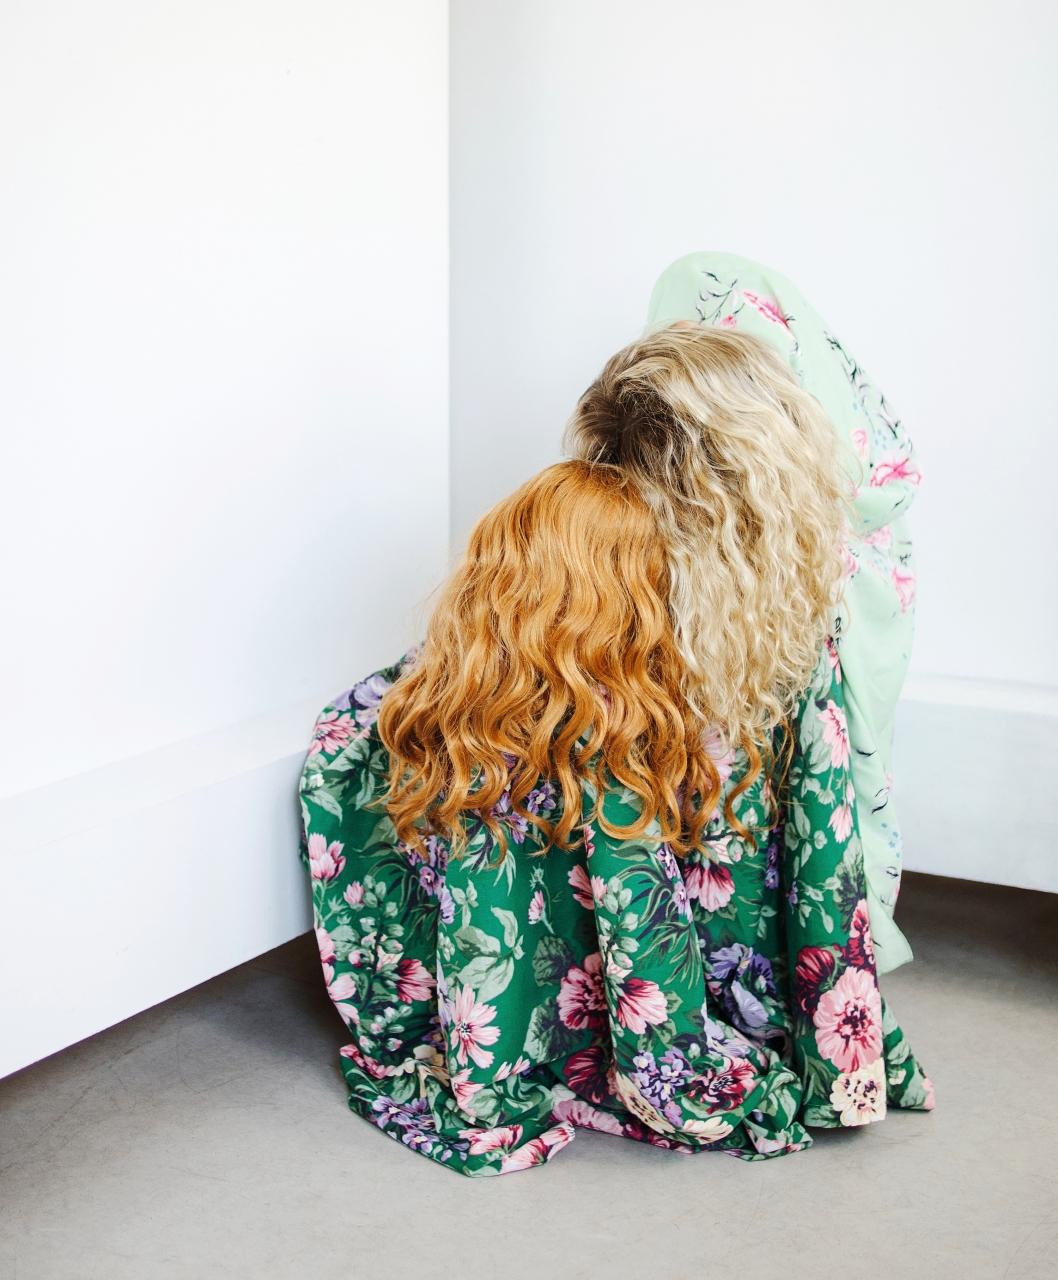 Allison Morris, Something or Other, 2018.